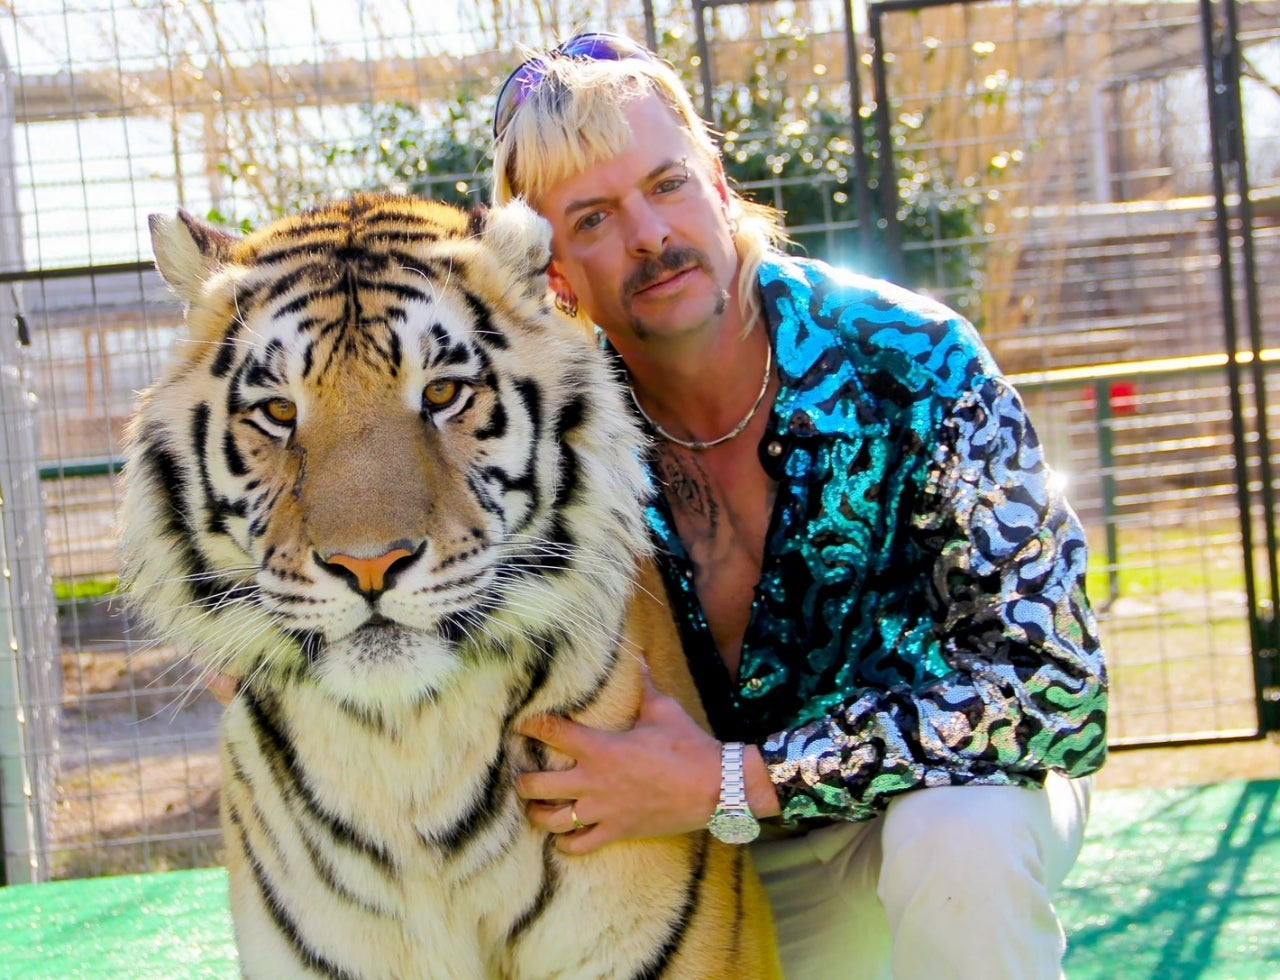 tiger-king-joe-exotic-netflix